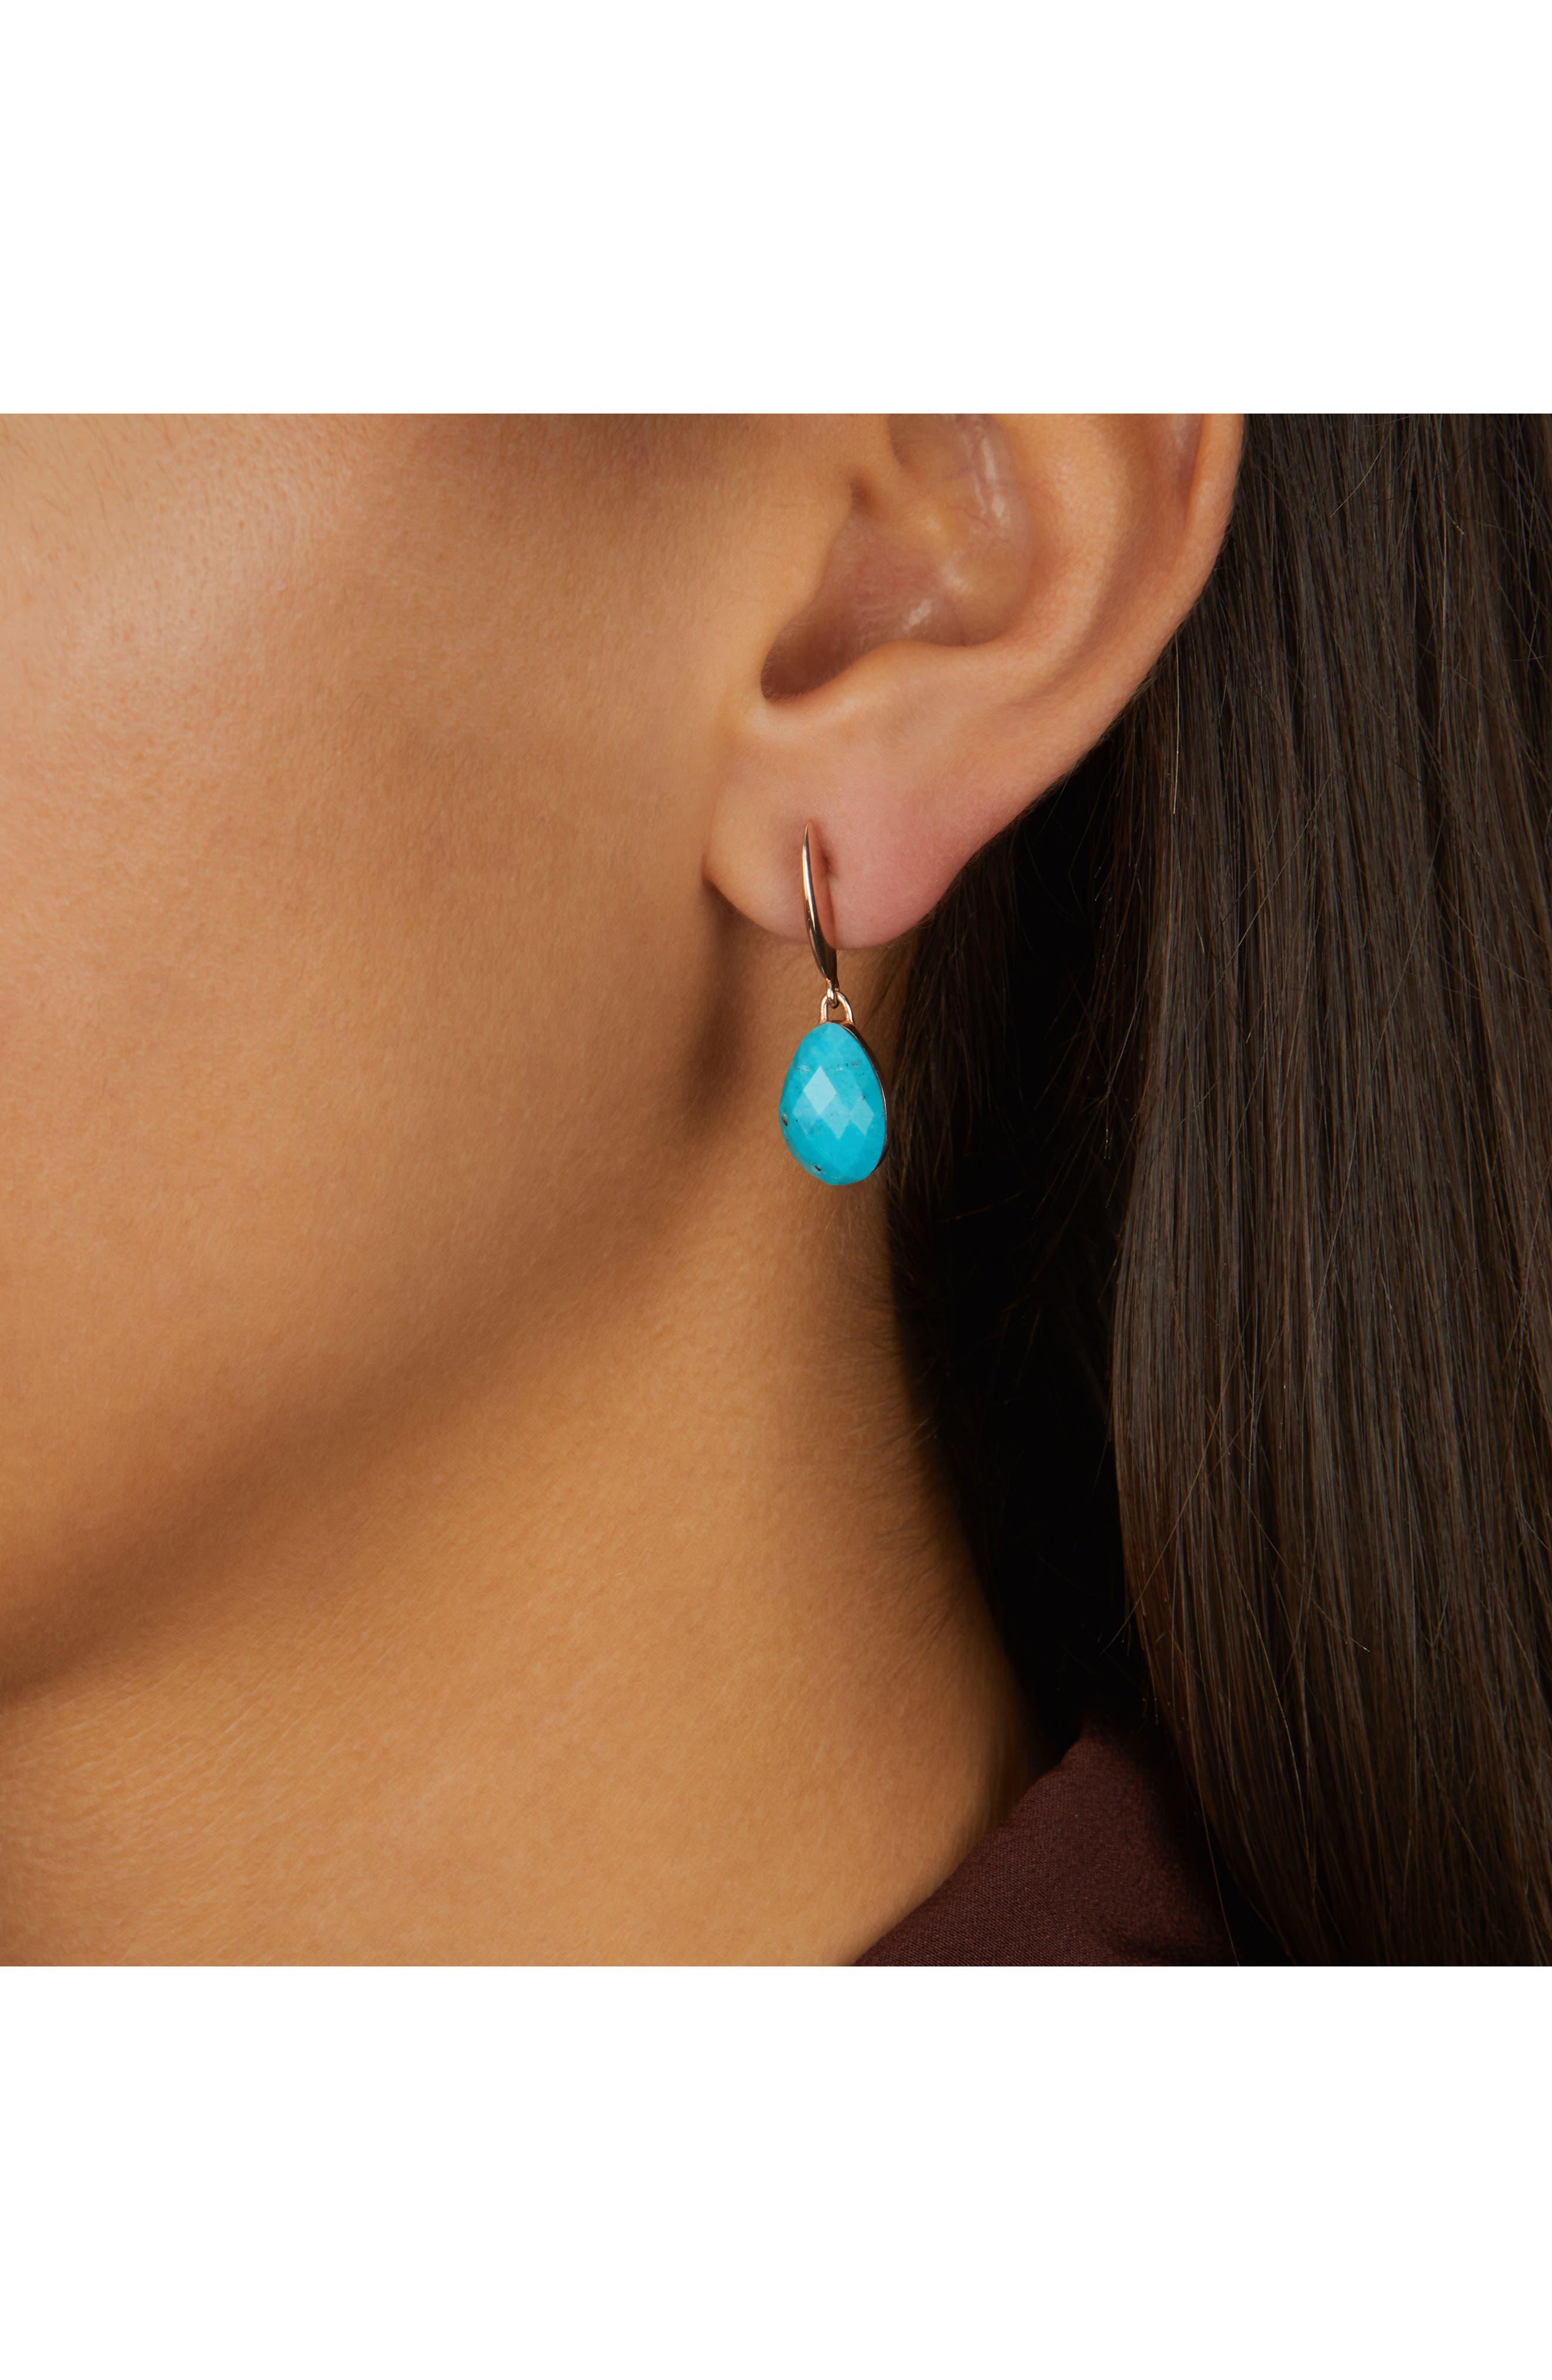 Nura Small Teardrop Earrings,                             Alternate thumbnail 2, color,                             TURQUOISE